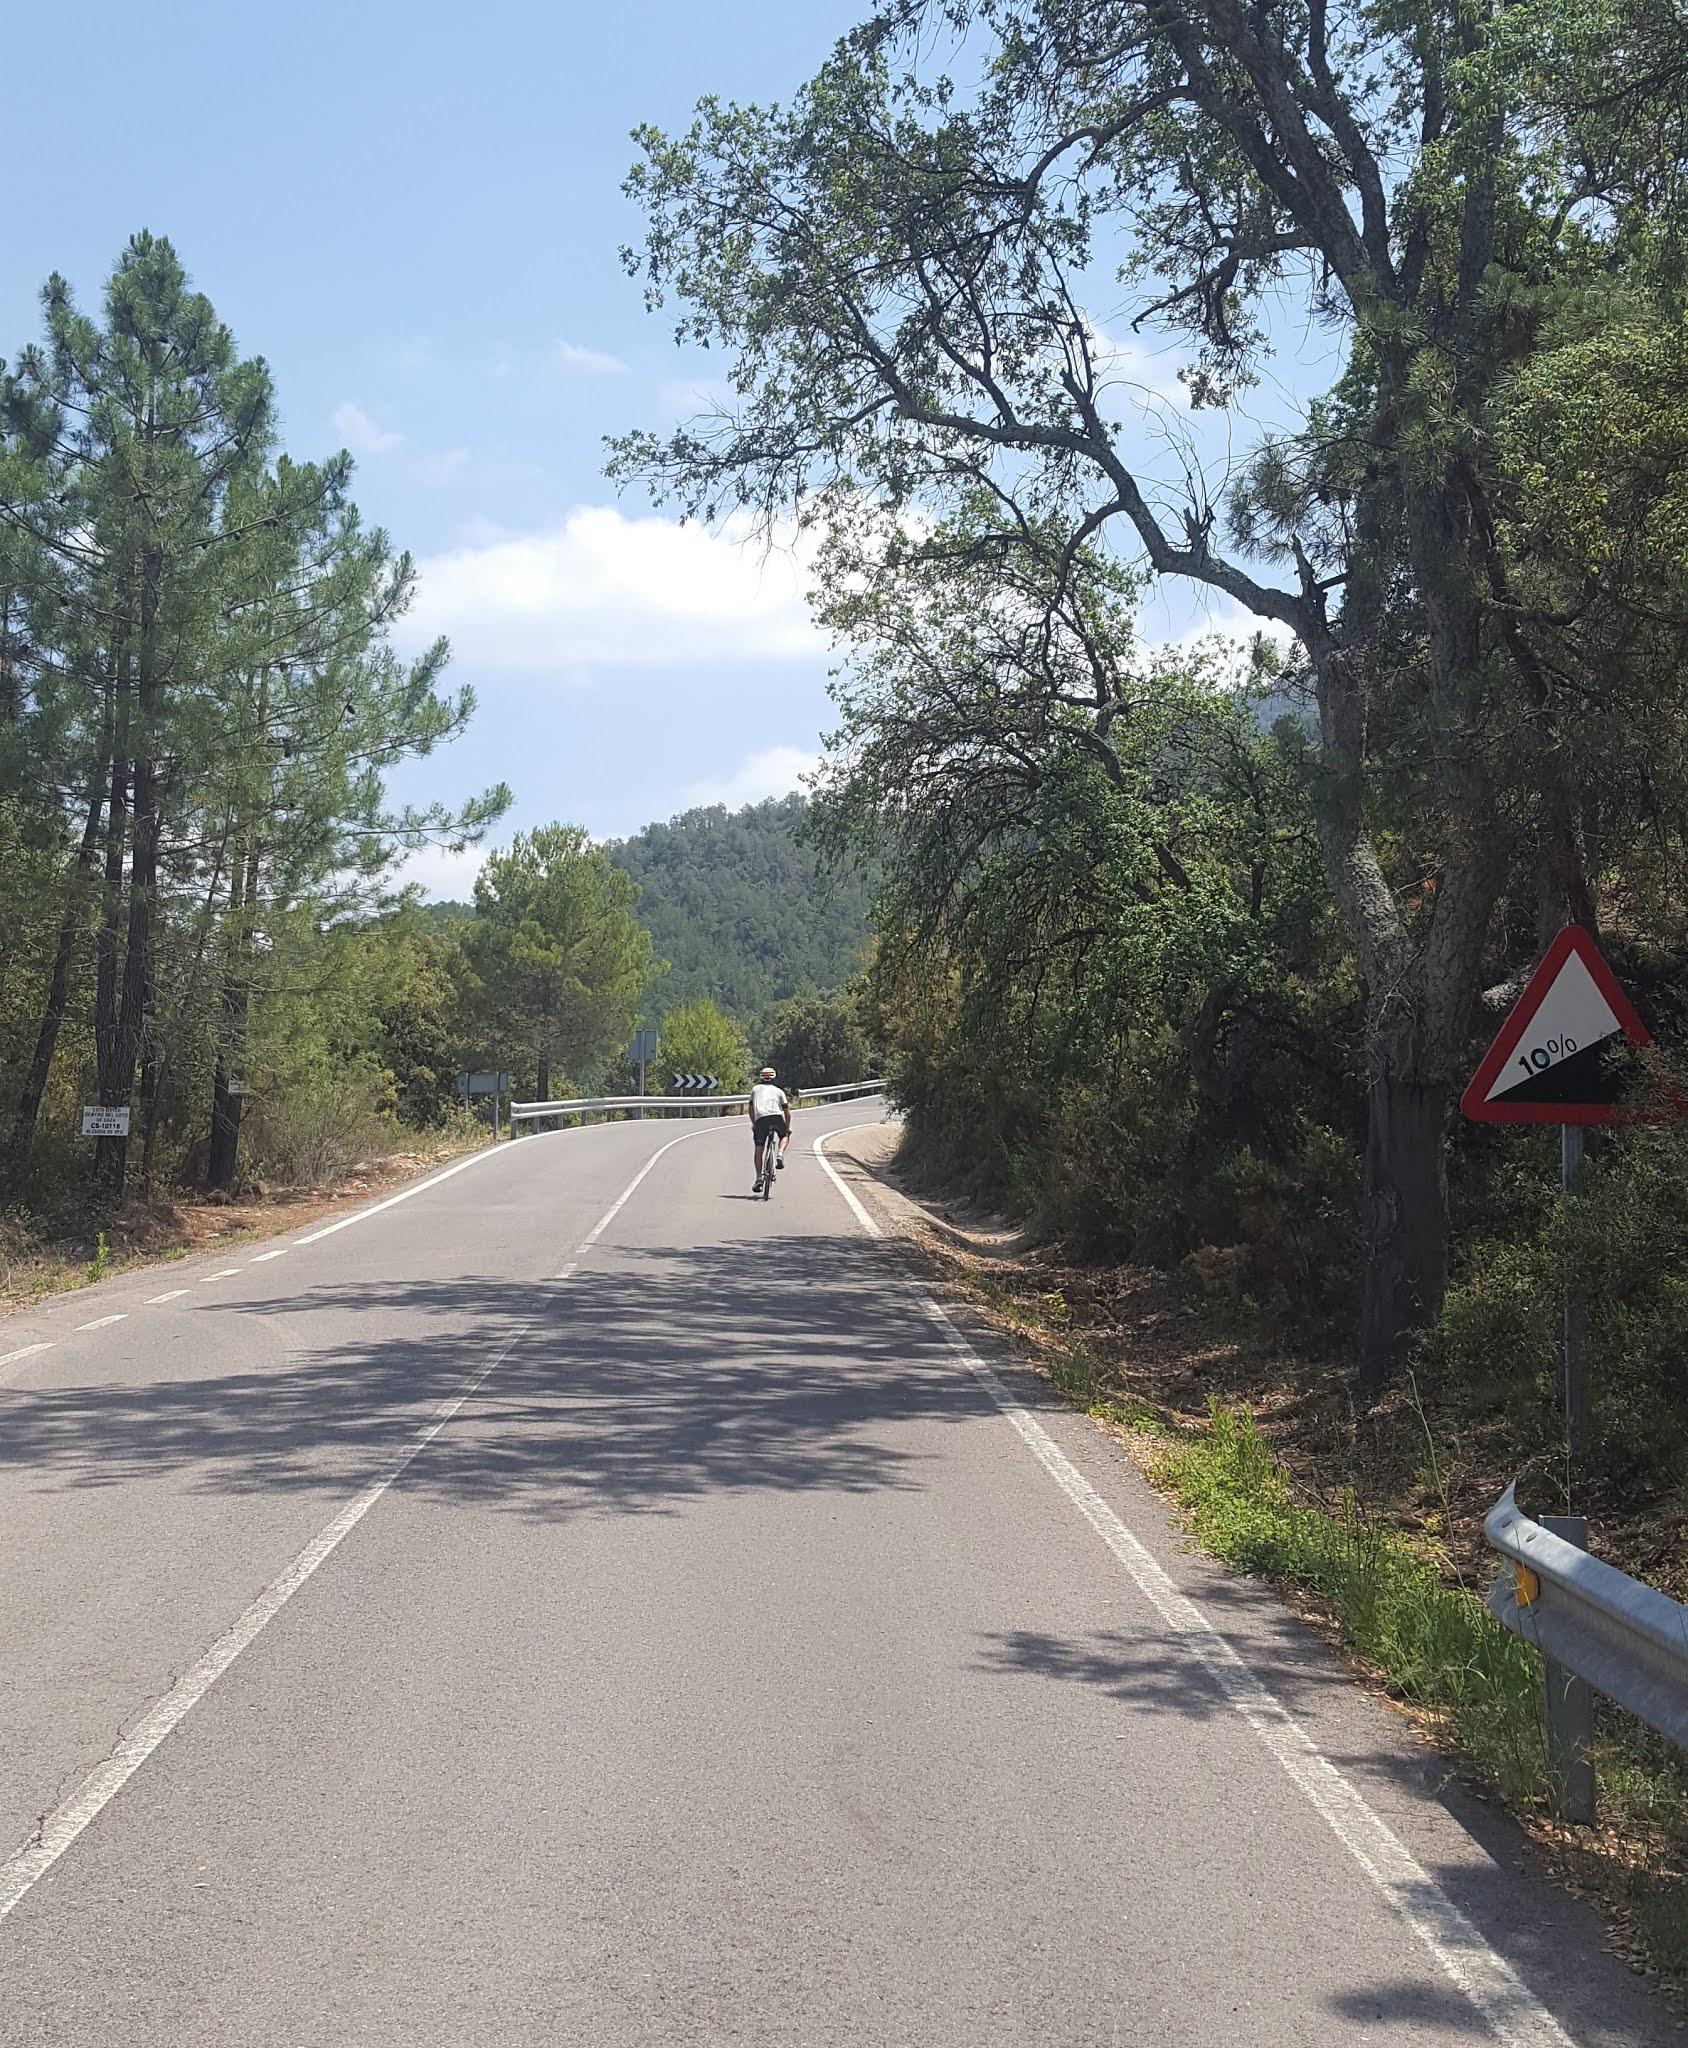 Ultradistance cyclist @sebicicleta cycling in Serra d'Espadà, Castellón. Spain